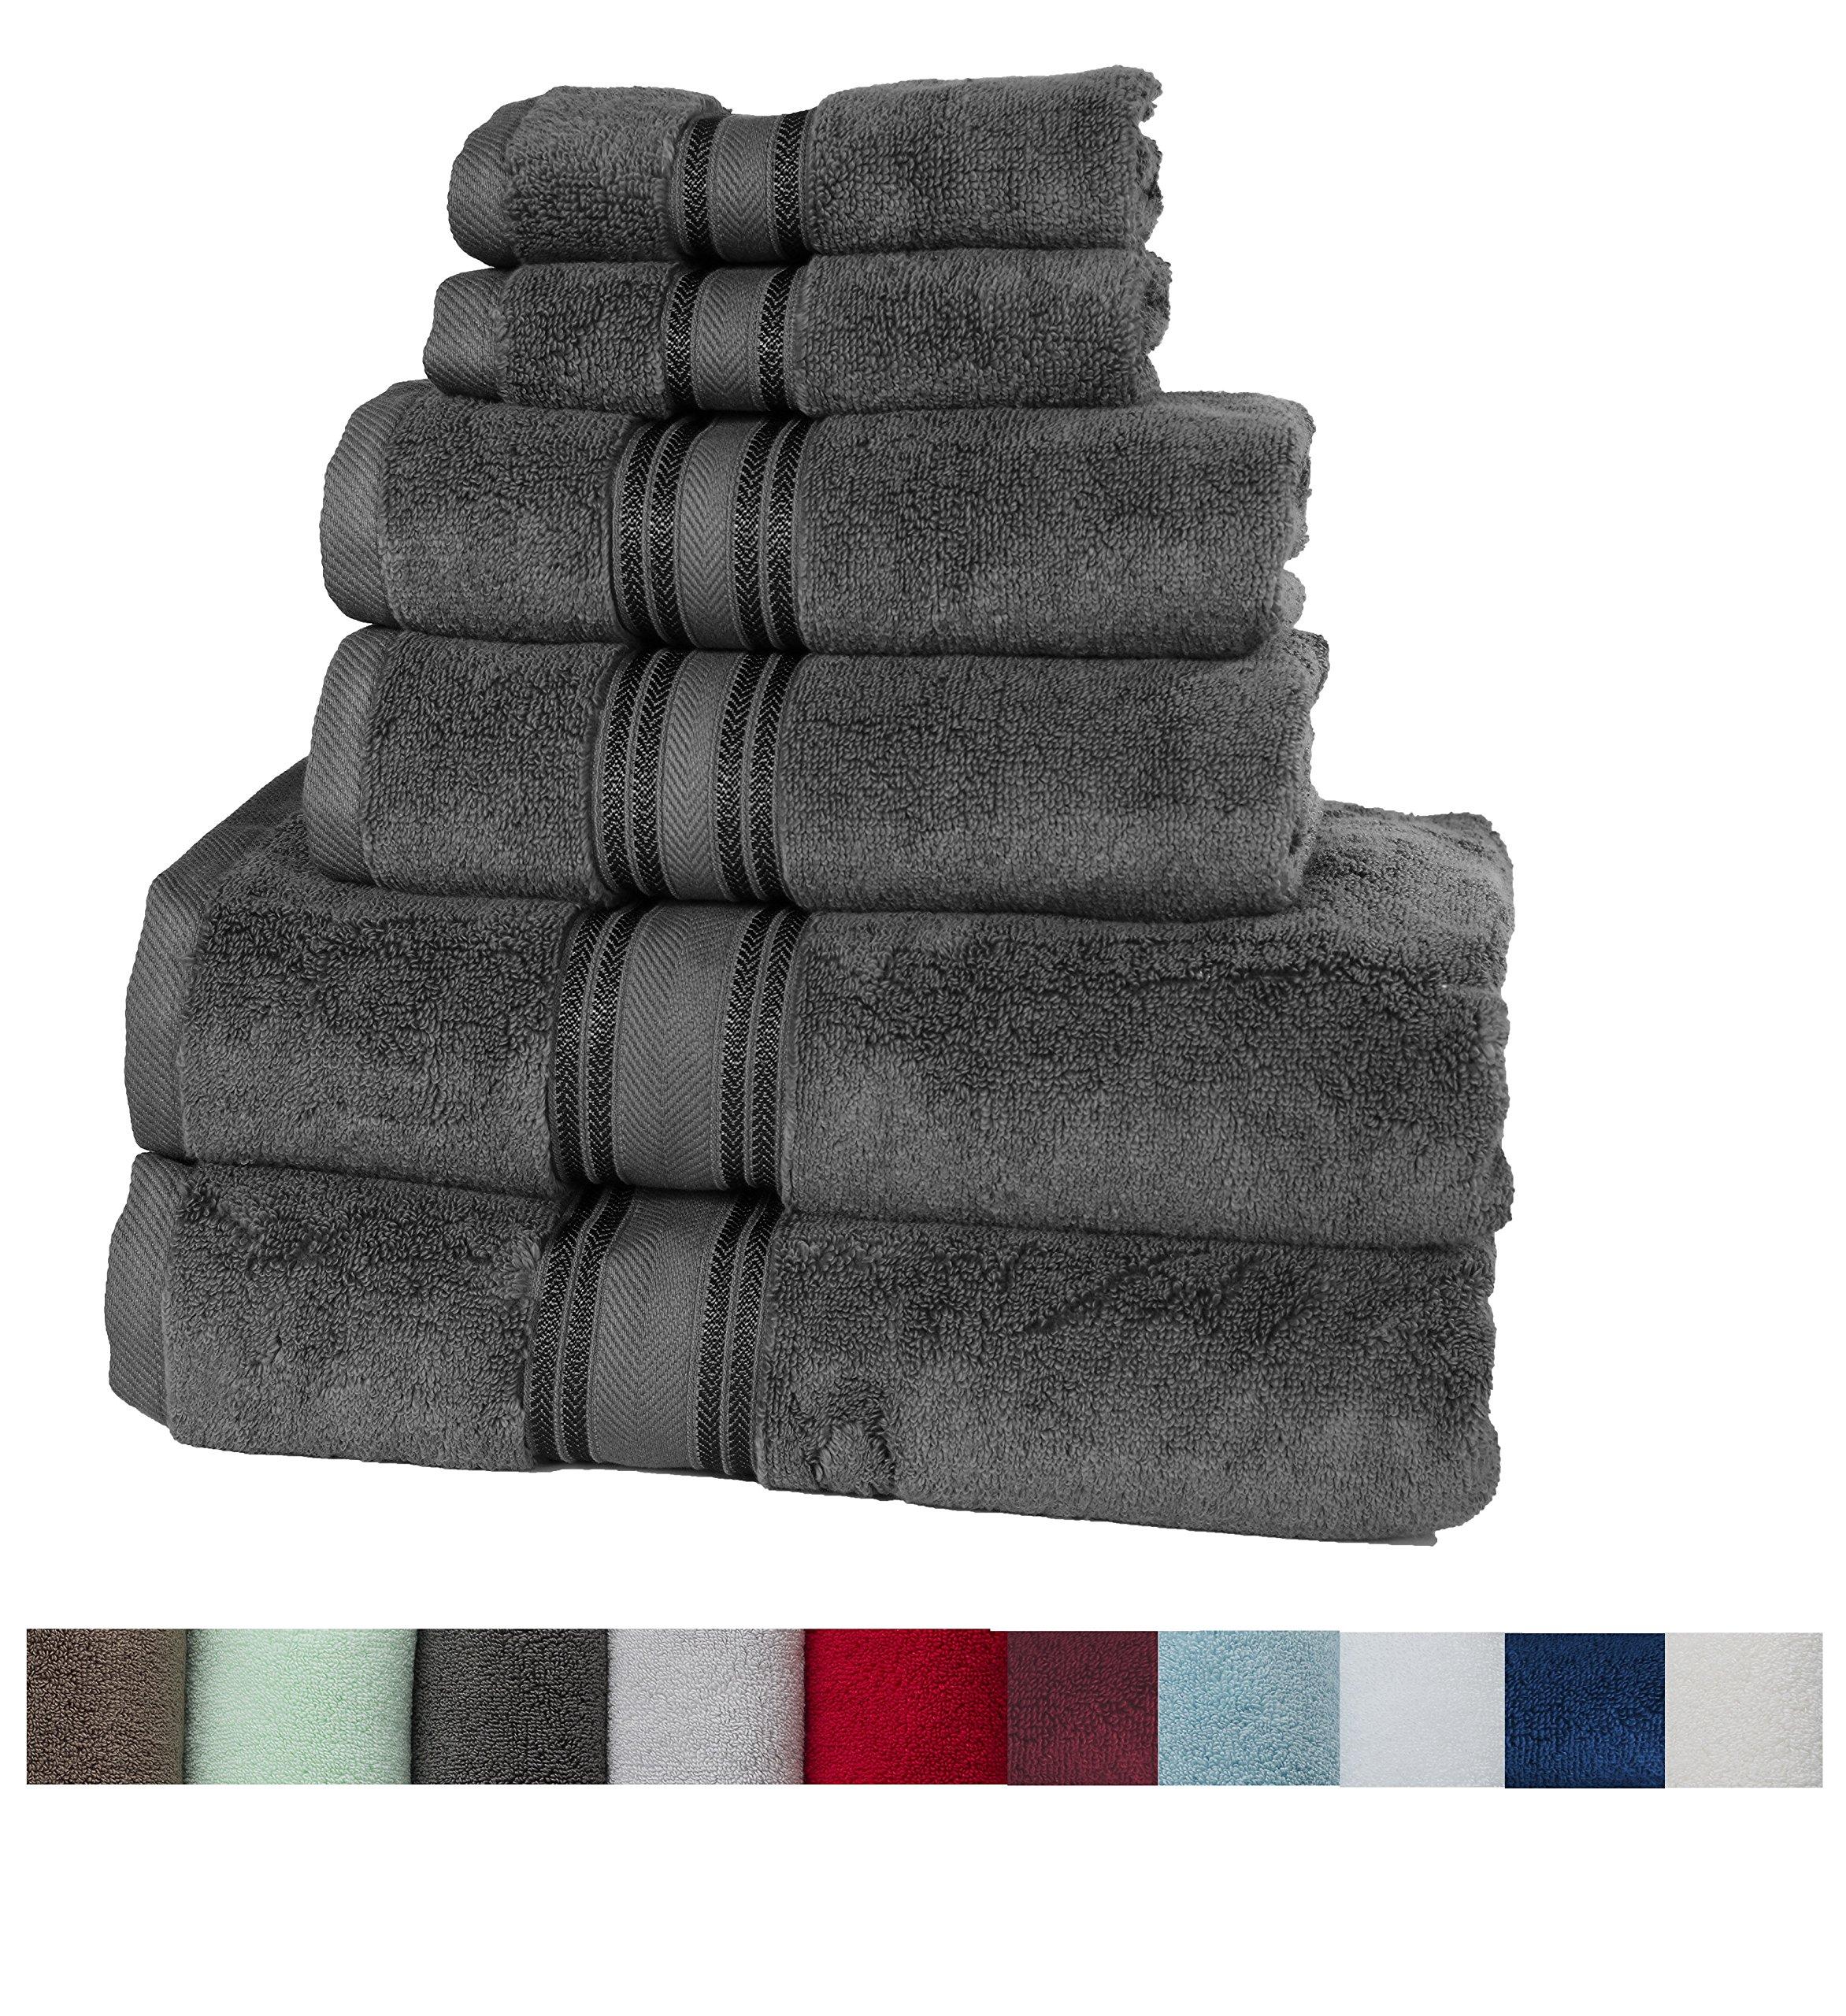 Casa Lino Quick Dry Super Zero Twist 6 Piece Bath Towel Set 7 Star Hotel Luxury Collection, 2 Bath Towel 28x54'', 2 Hand Towel- 16x28'', Face Towel- 13x13'' (Grey)